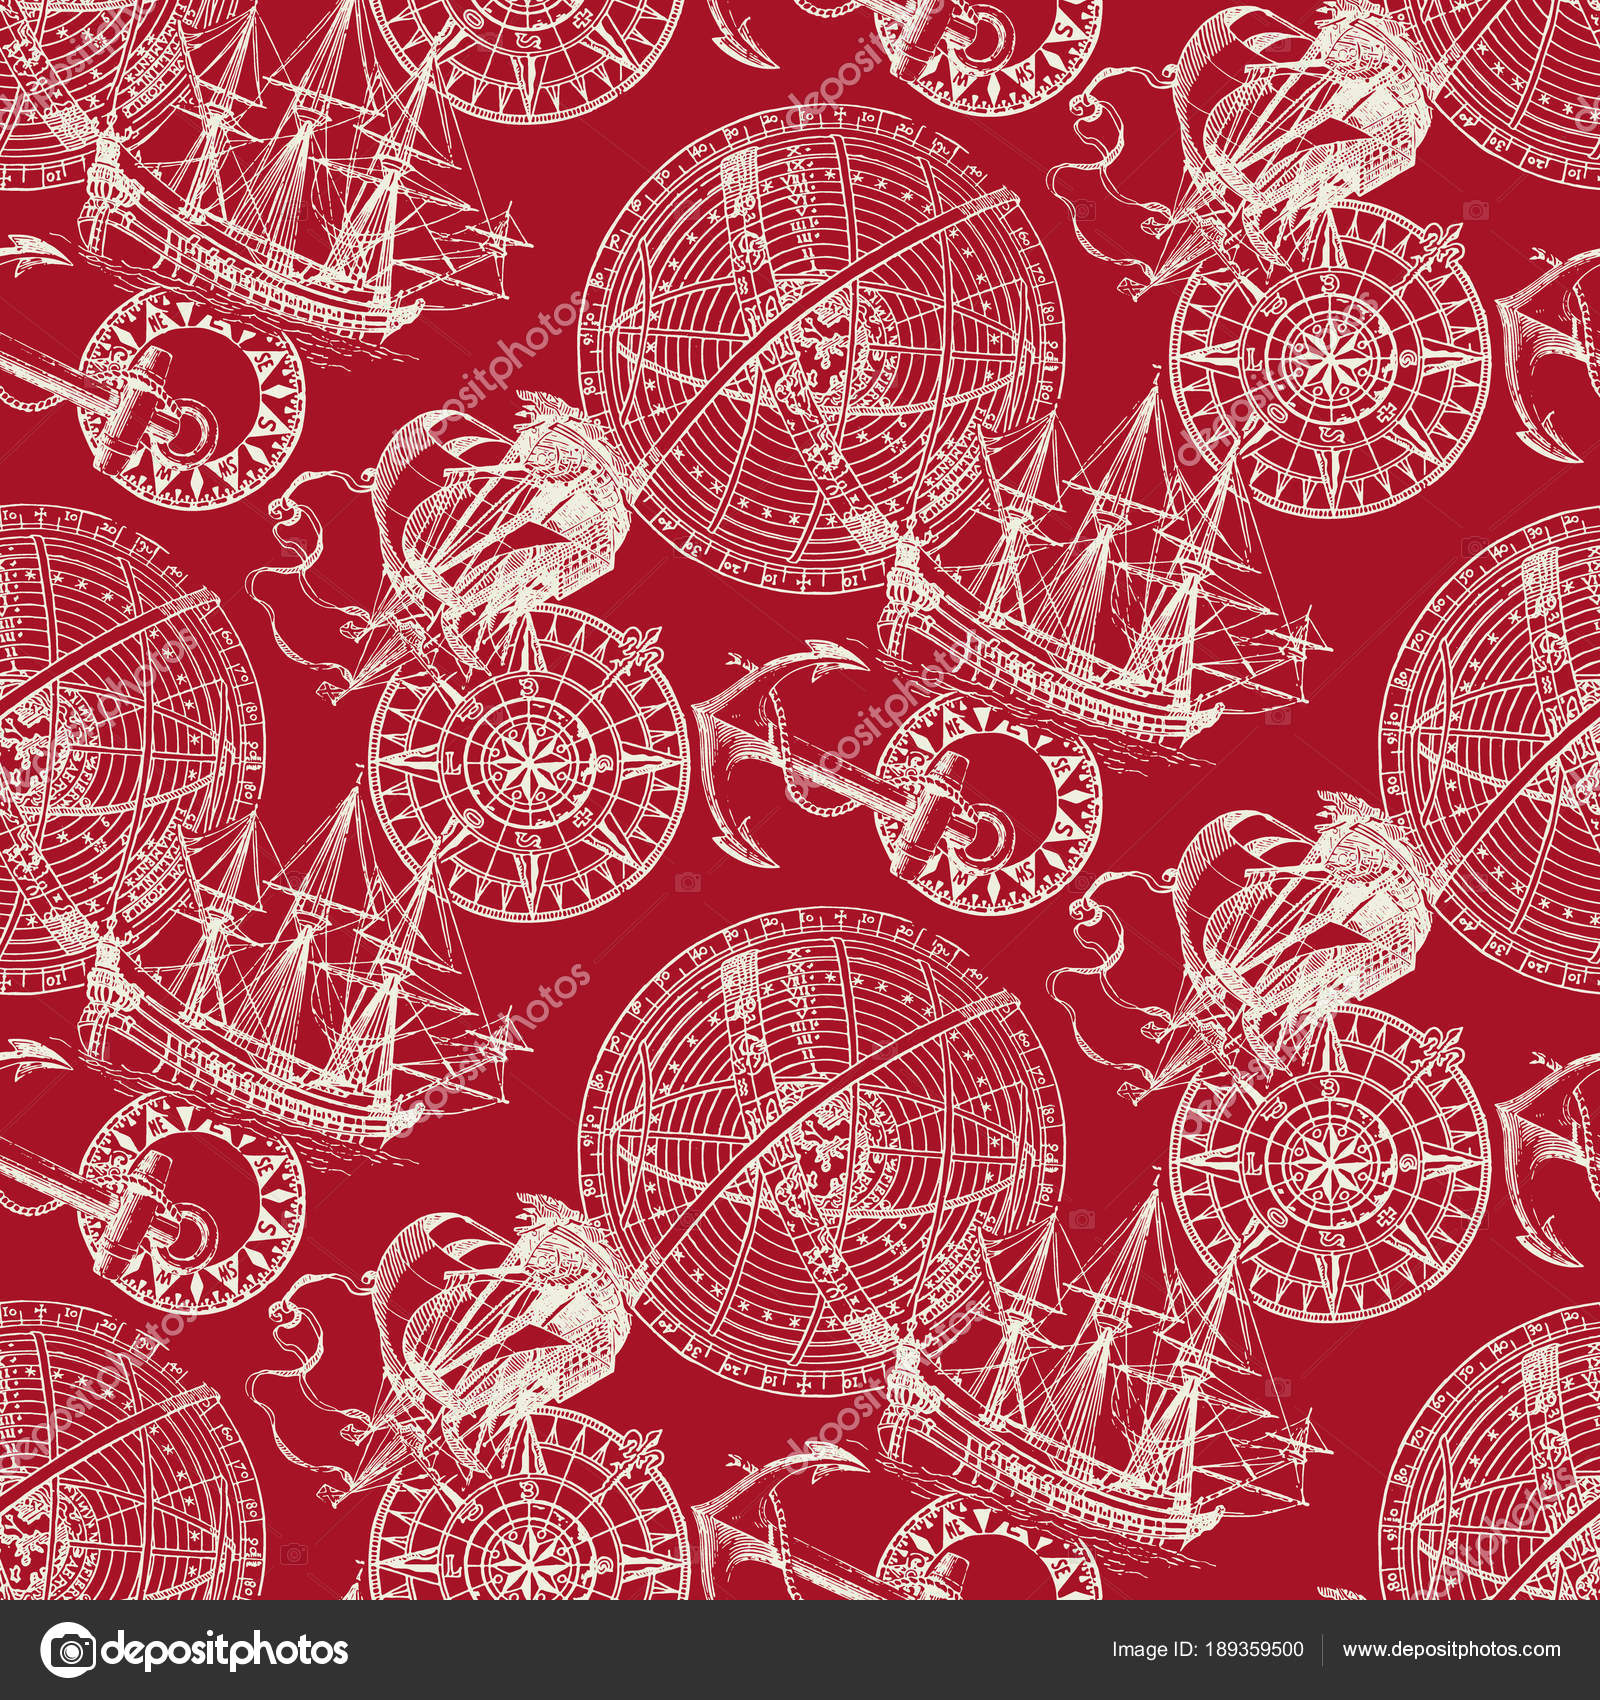 Sailing Boat Image Pattern Made Pattern Image Sailing Boat — Stock